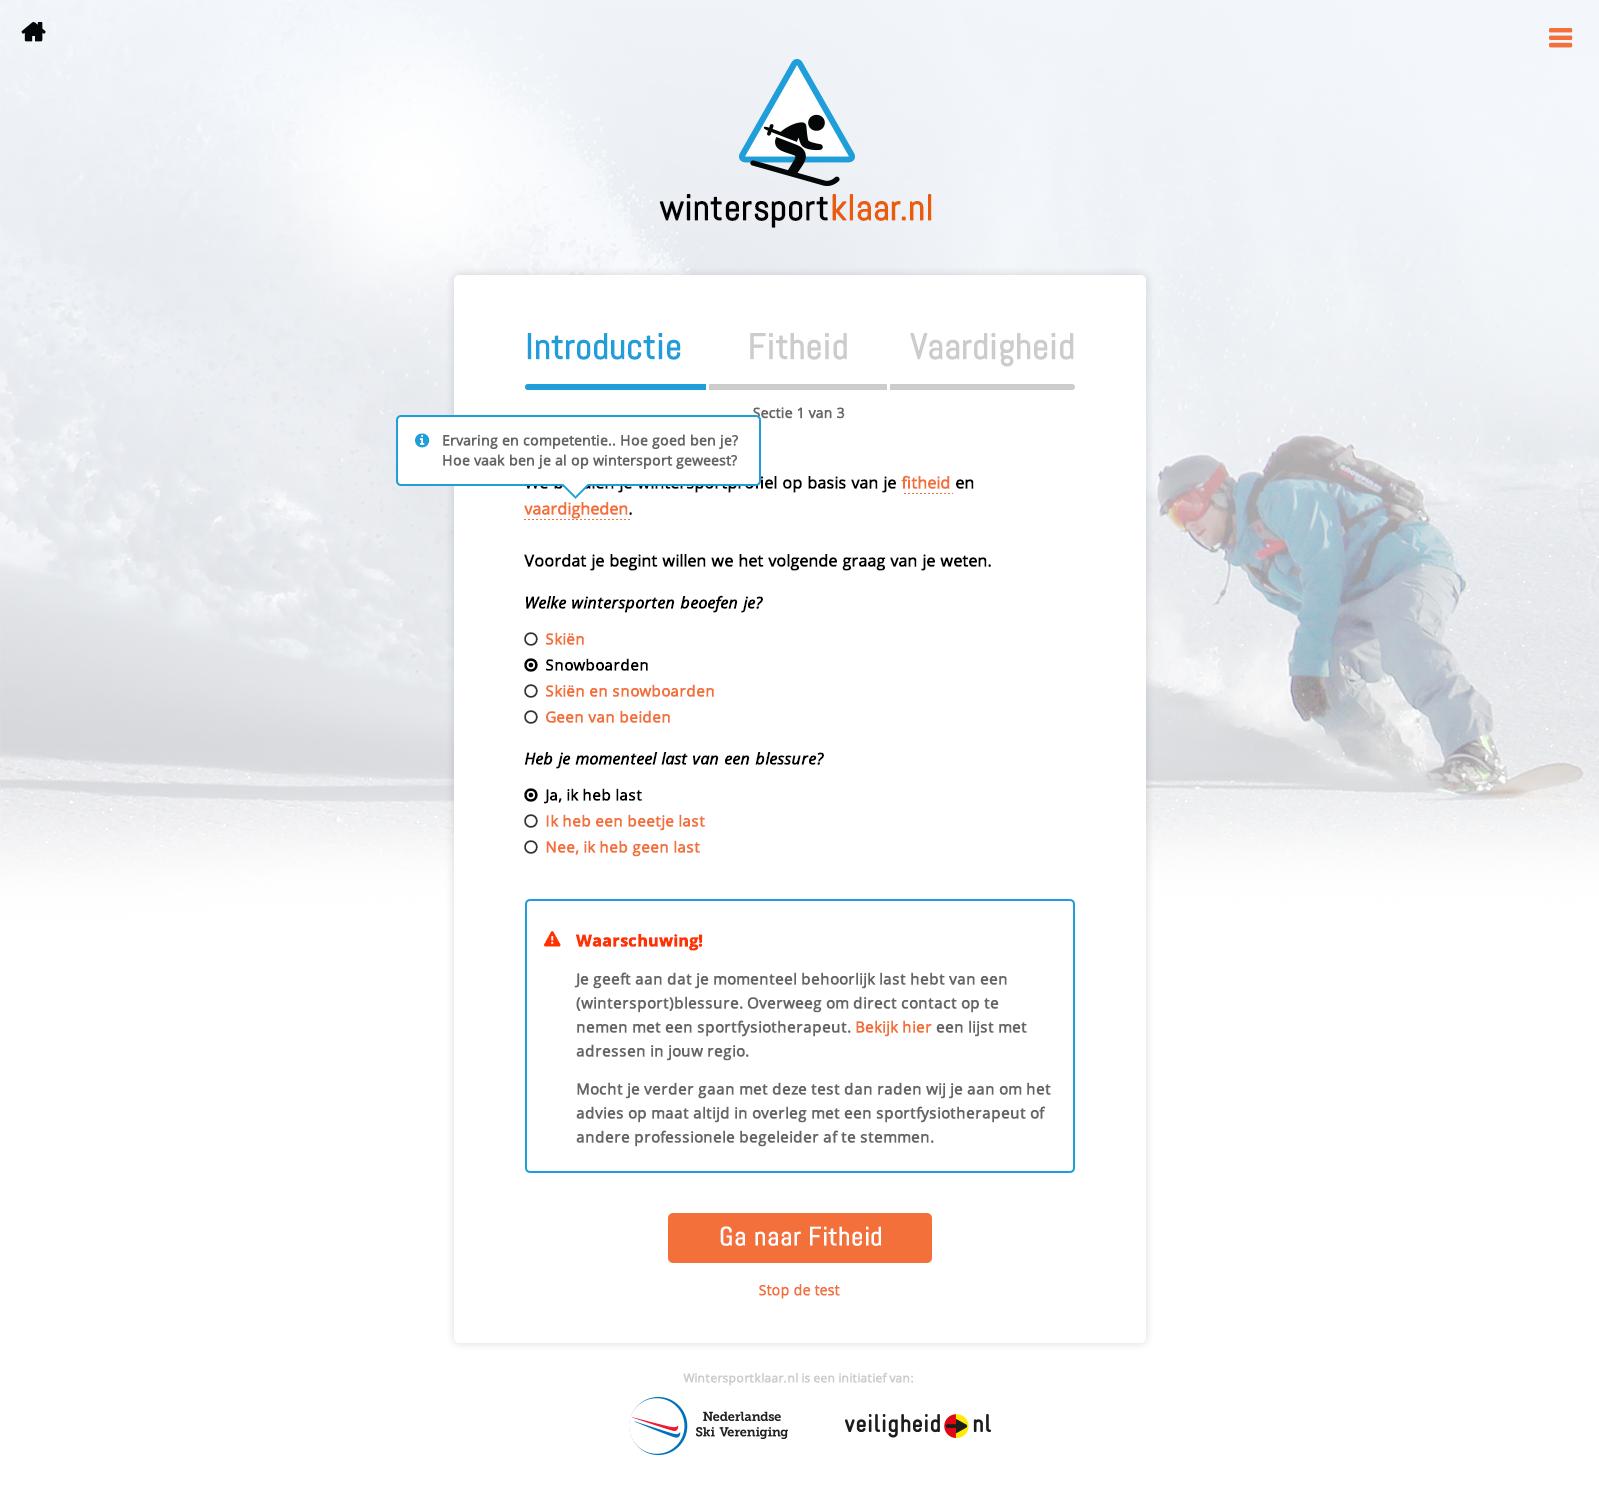 ski-2a-e1488892400146.png